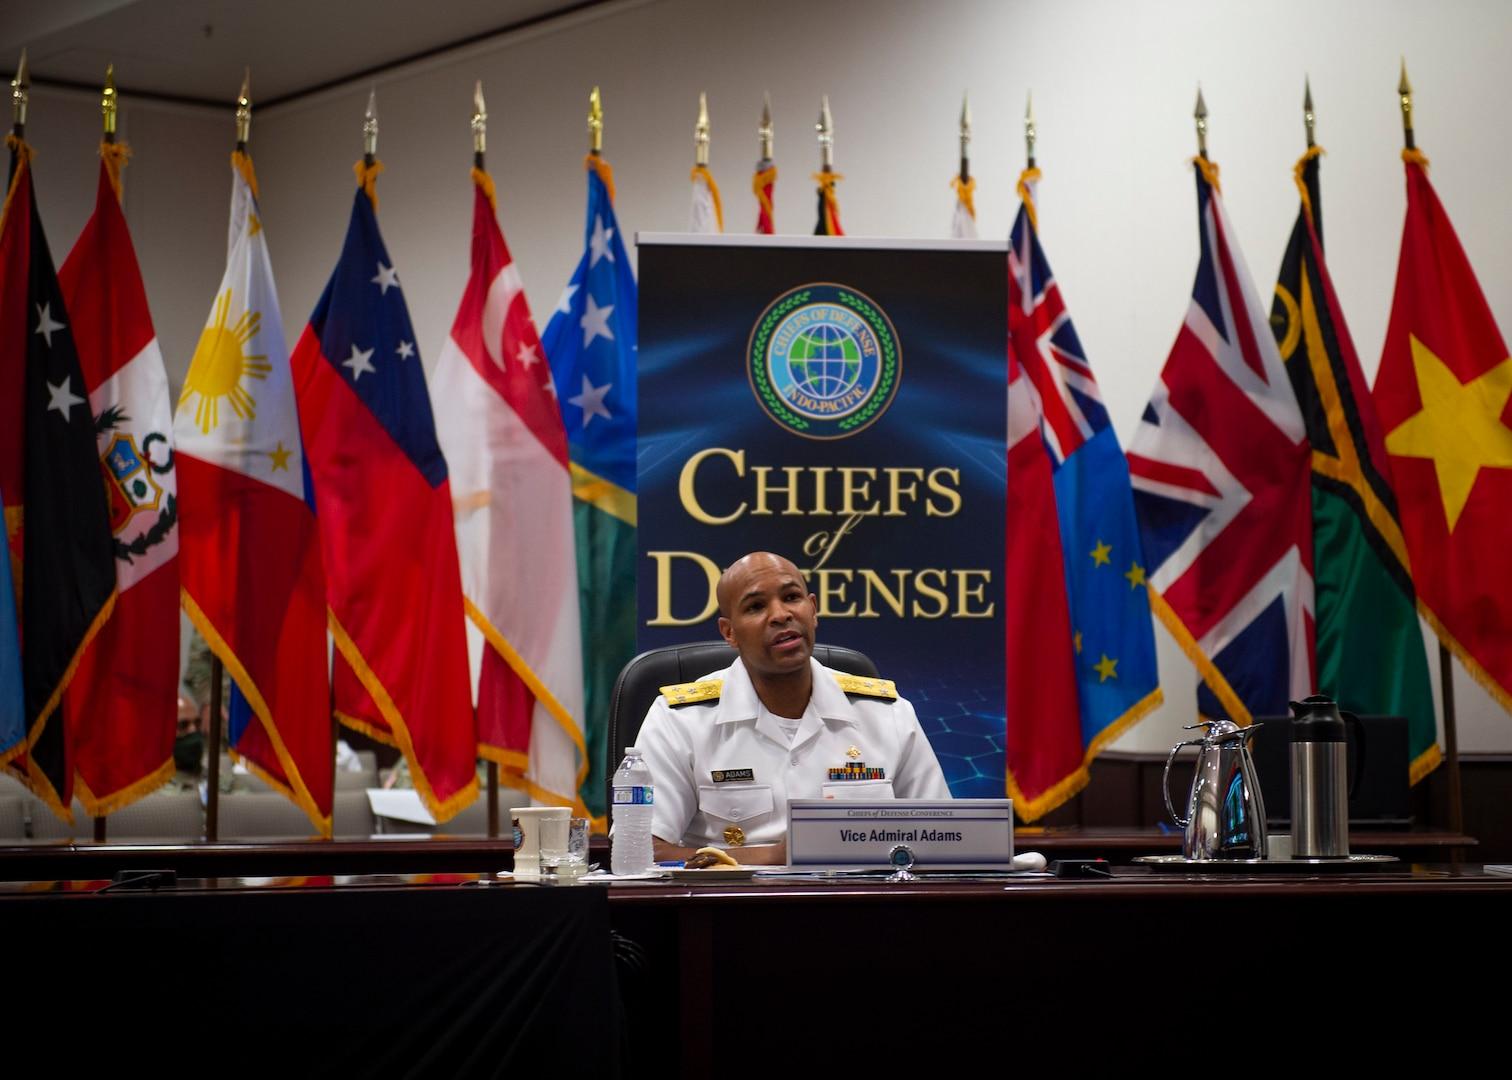 Vice Admiral Jerome M. Adams, United States Surgeon General